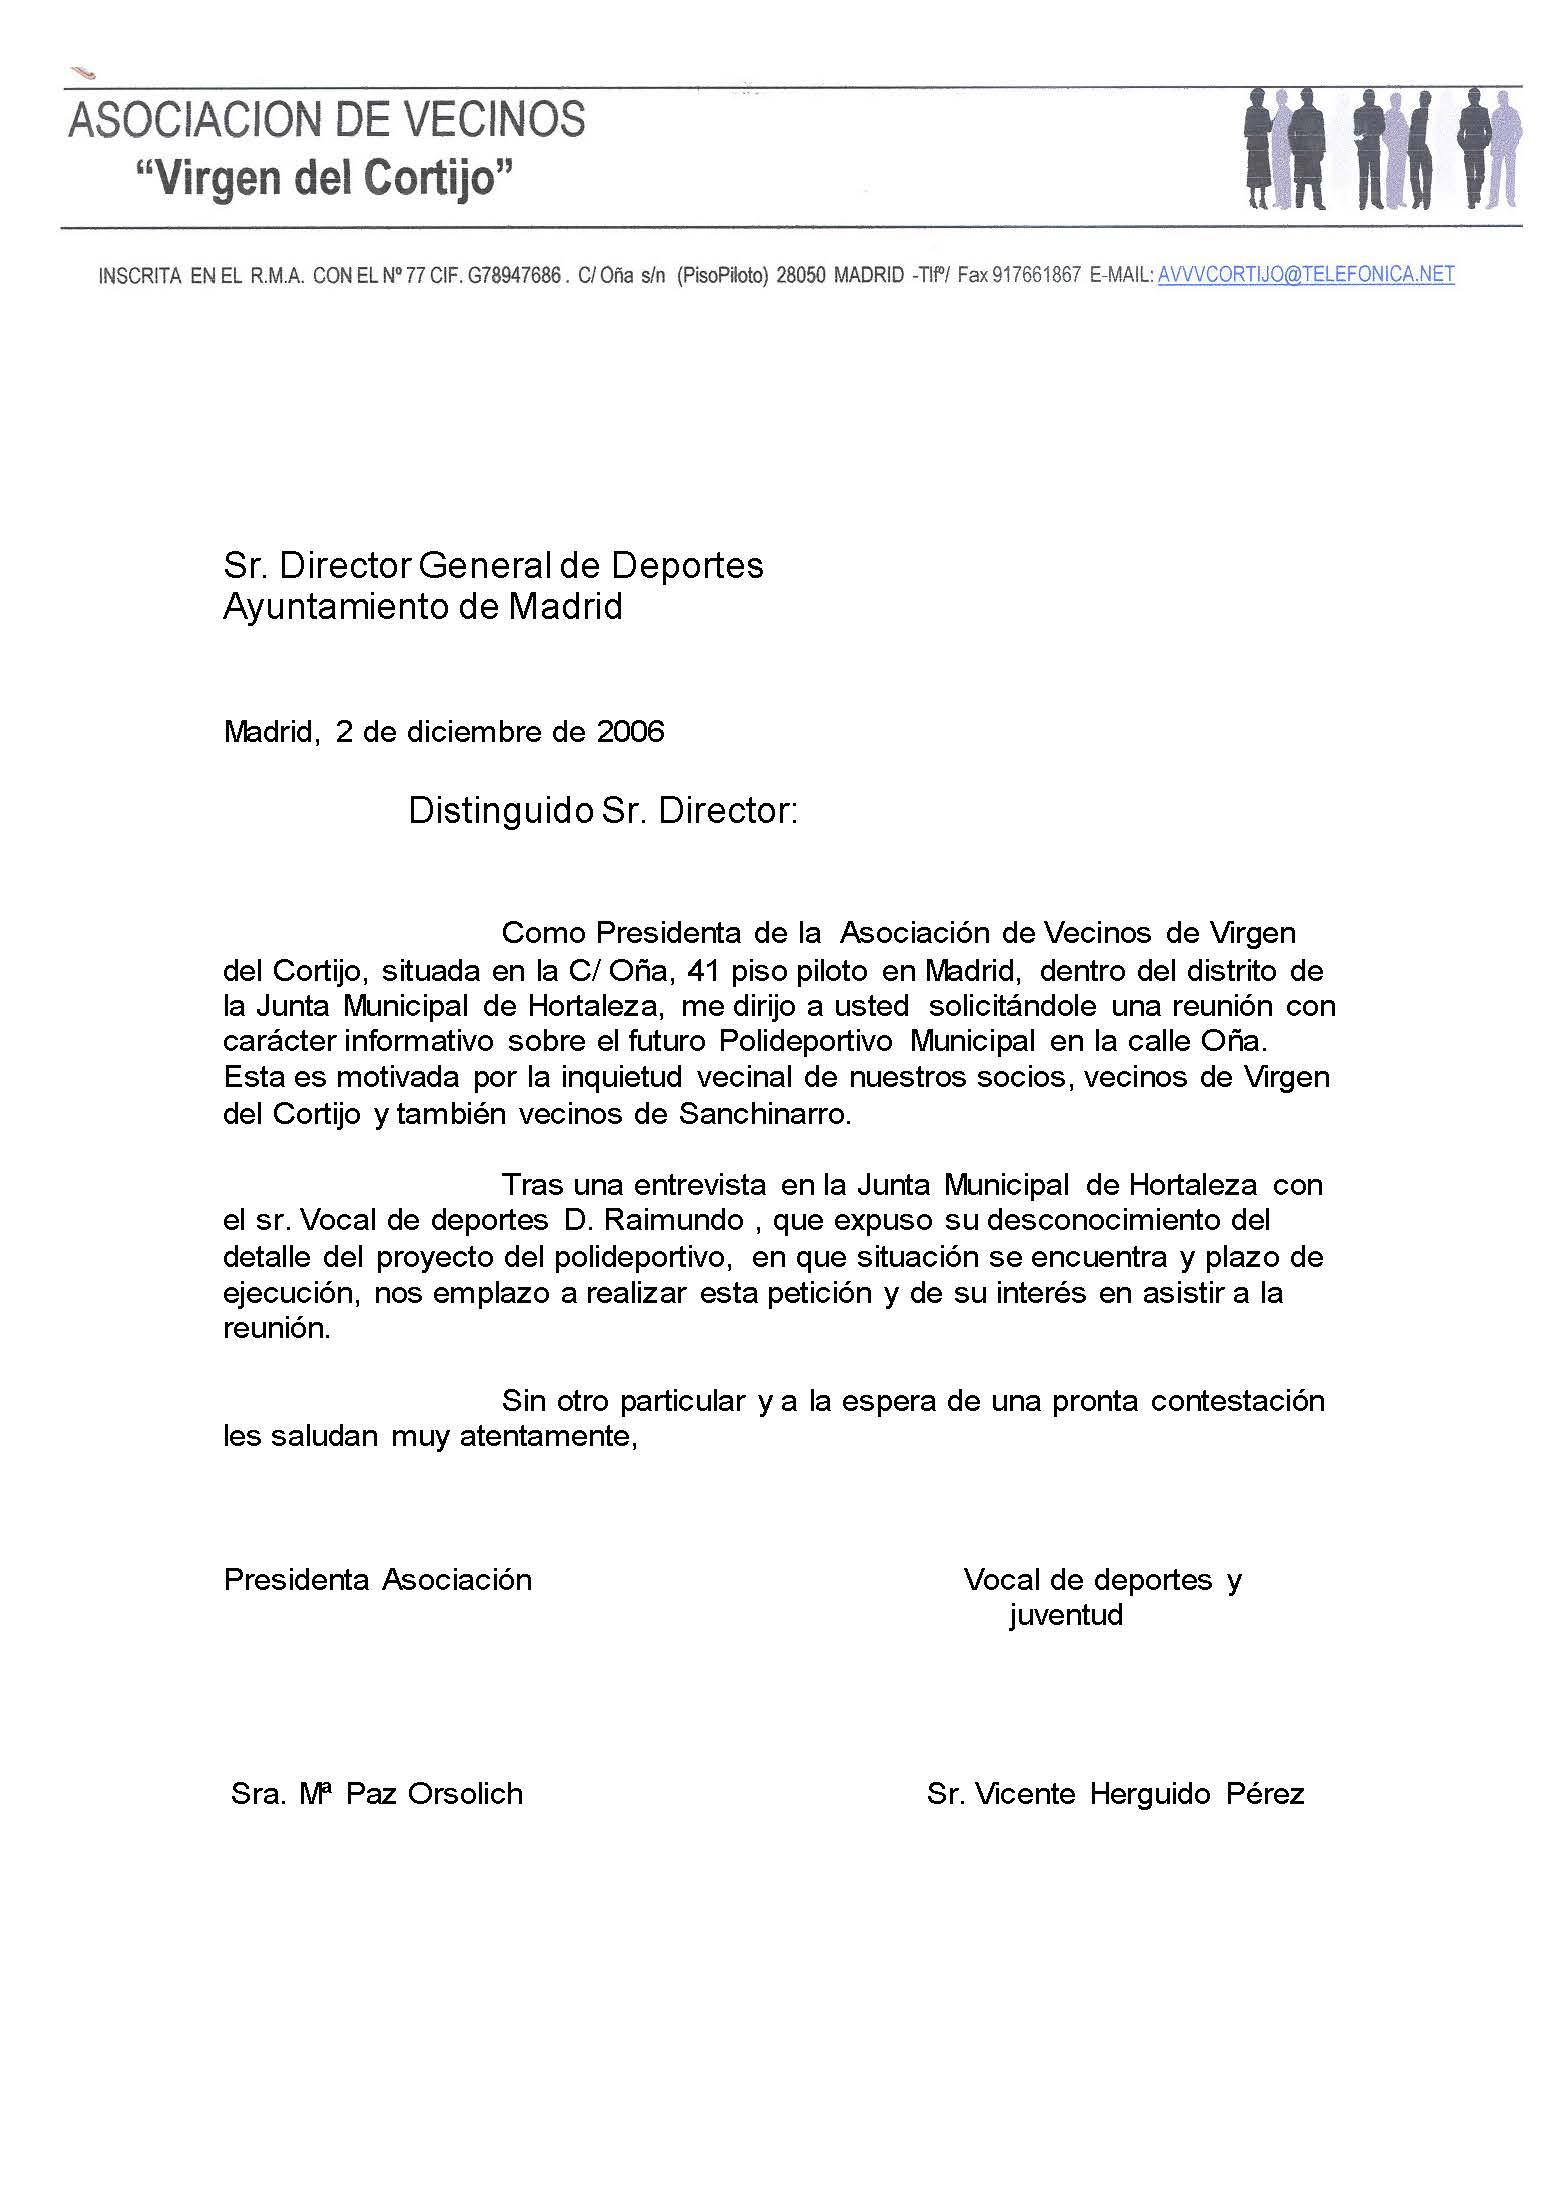 carta director g deportes ayto madrid